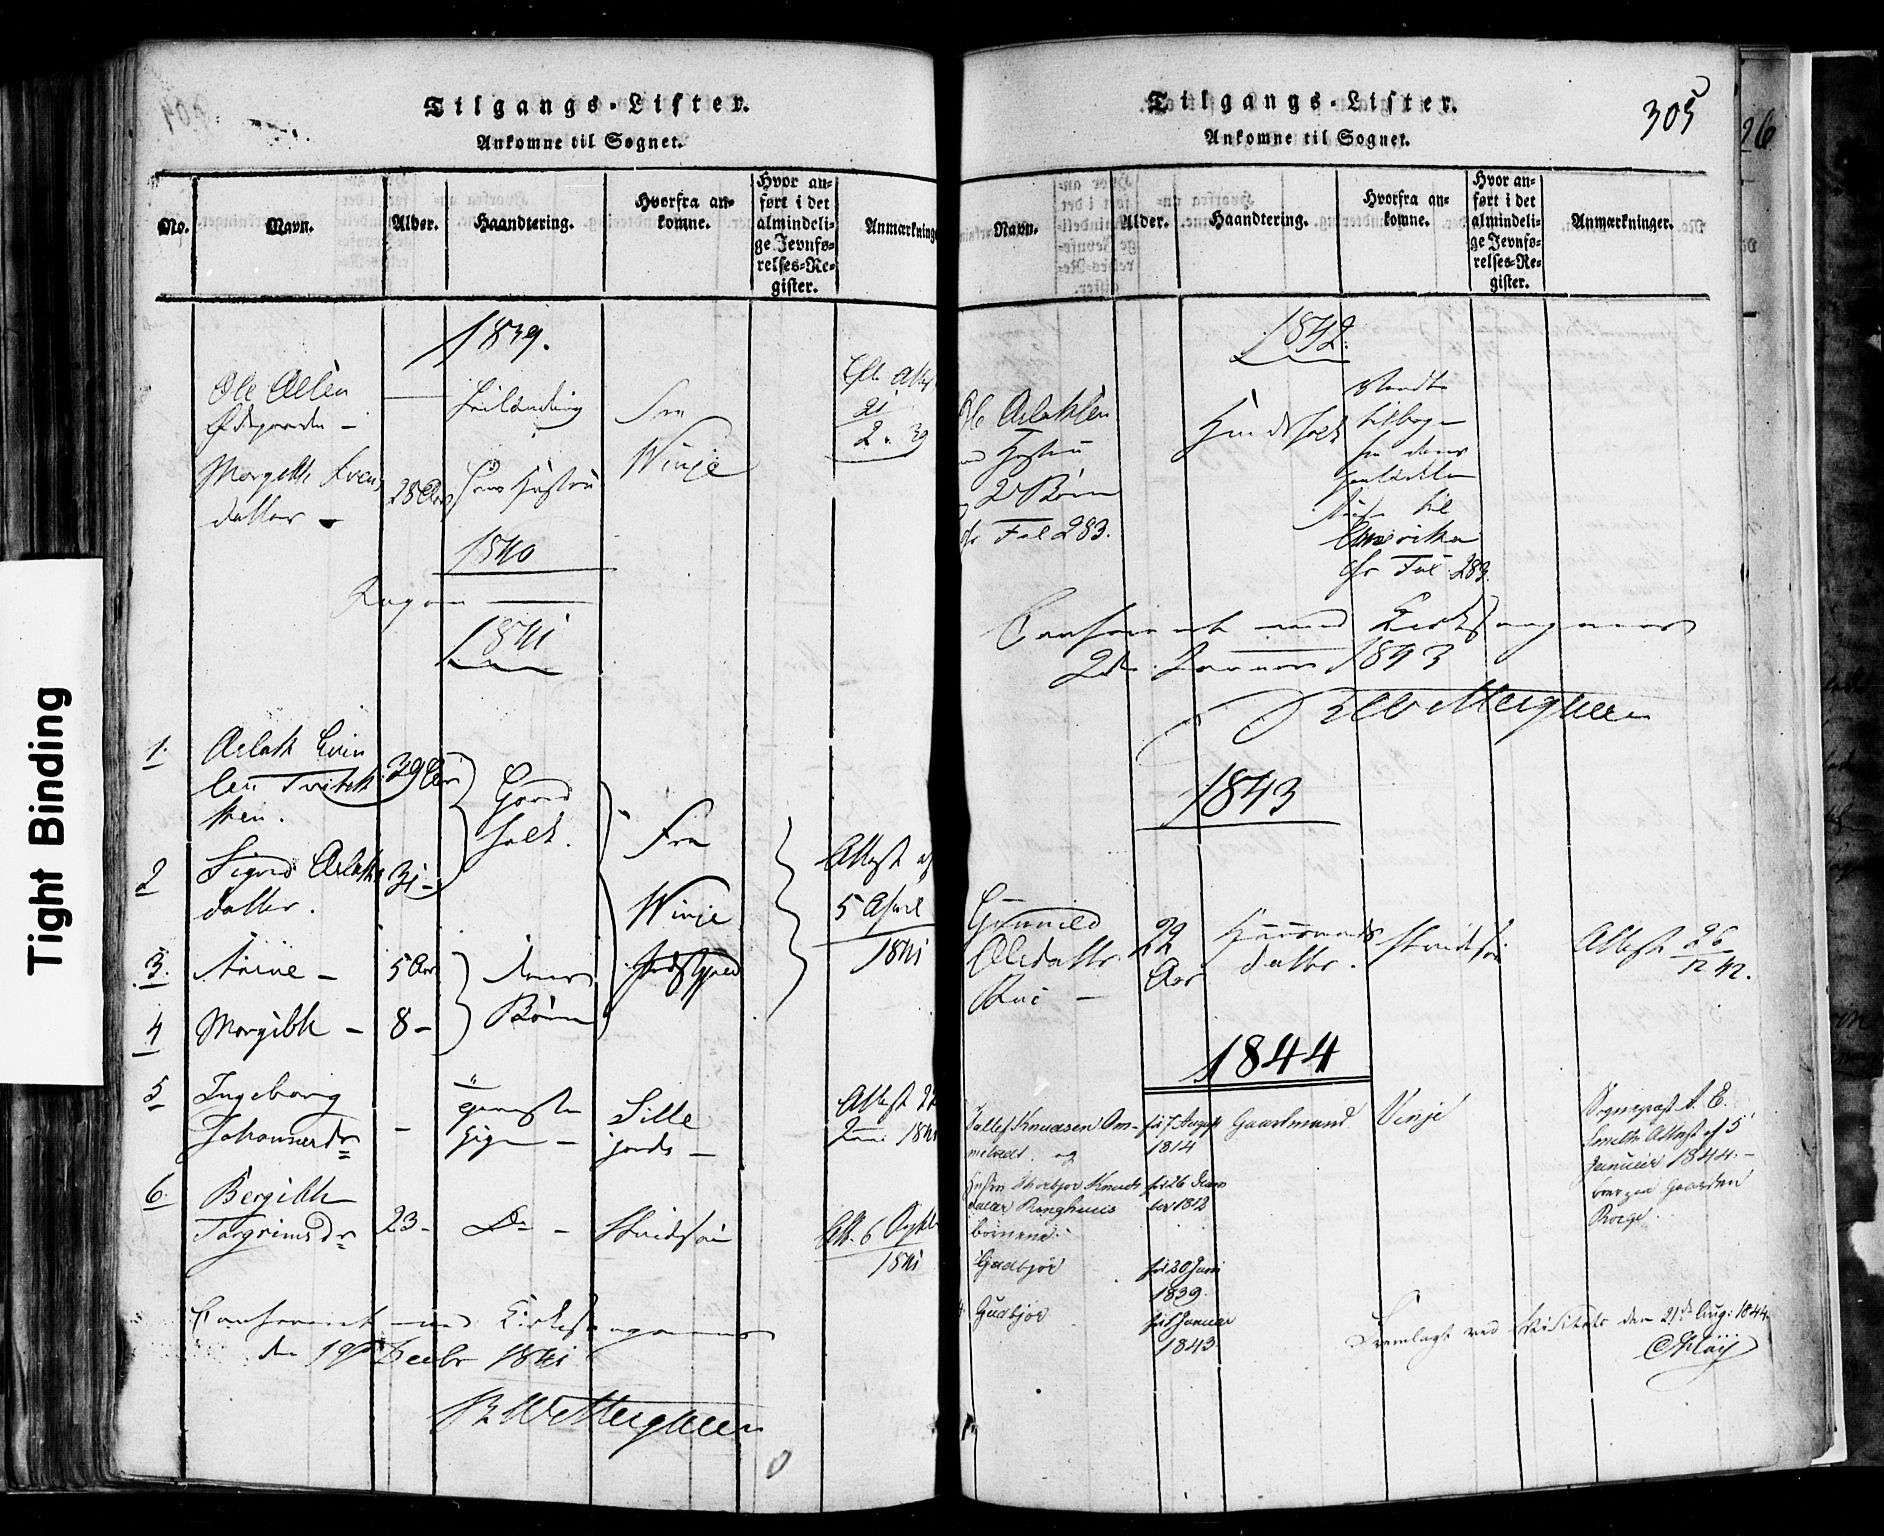 SAKO, Rauland kirkebøker, F/Fa/L0002: Ministerialbok nr. 2, 1815-1860, s. 305